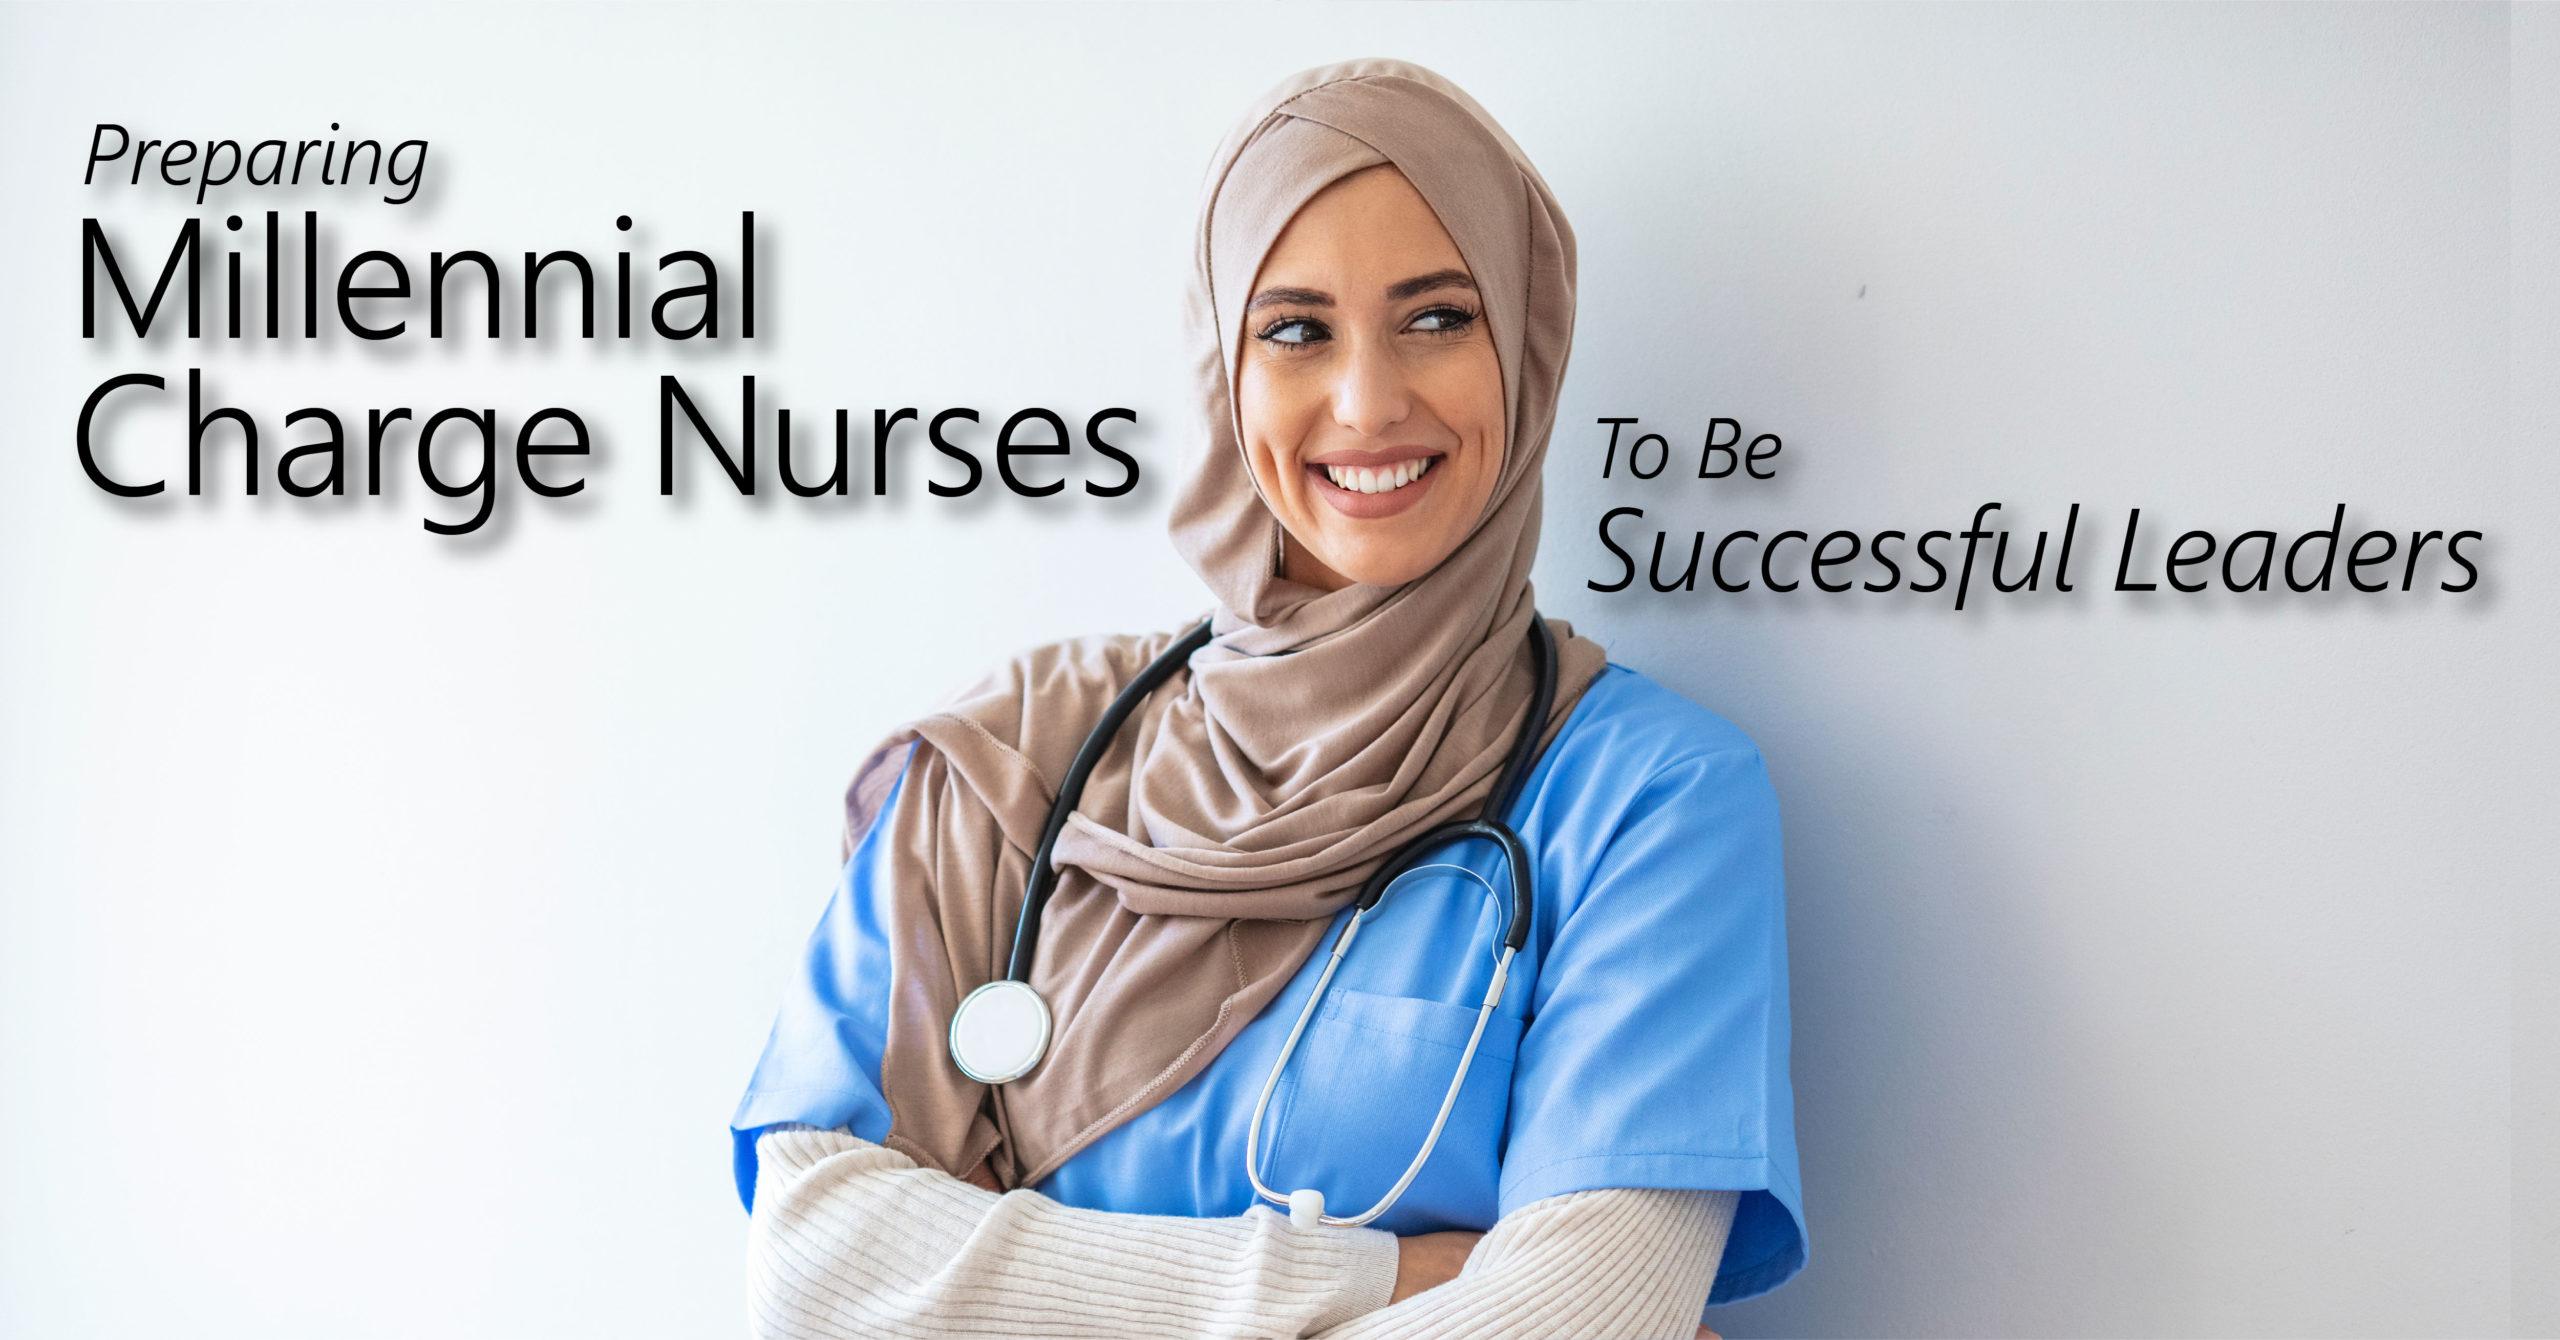 Preparing Millennial Charge Nurses To Be Successful Leaders 1